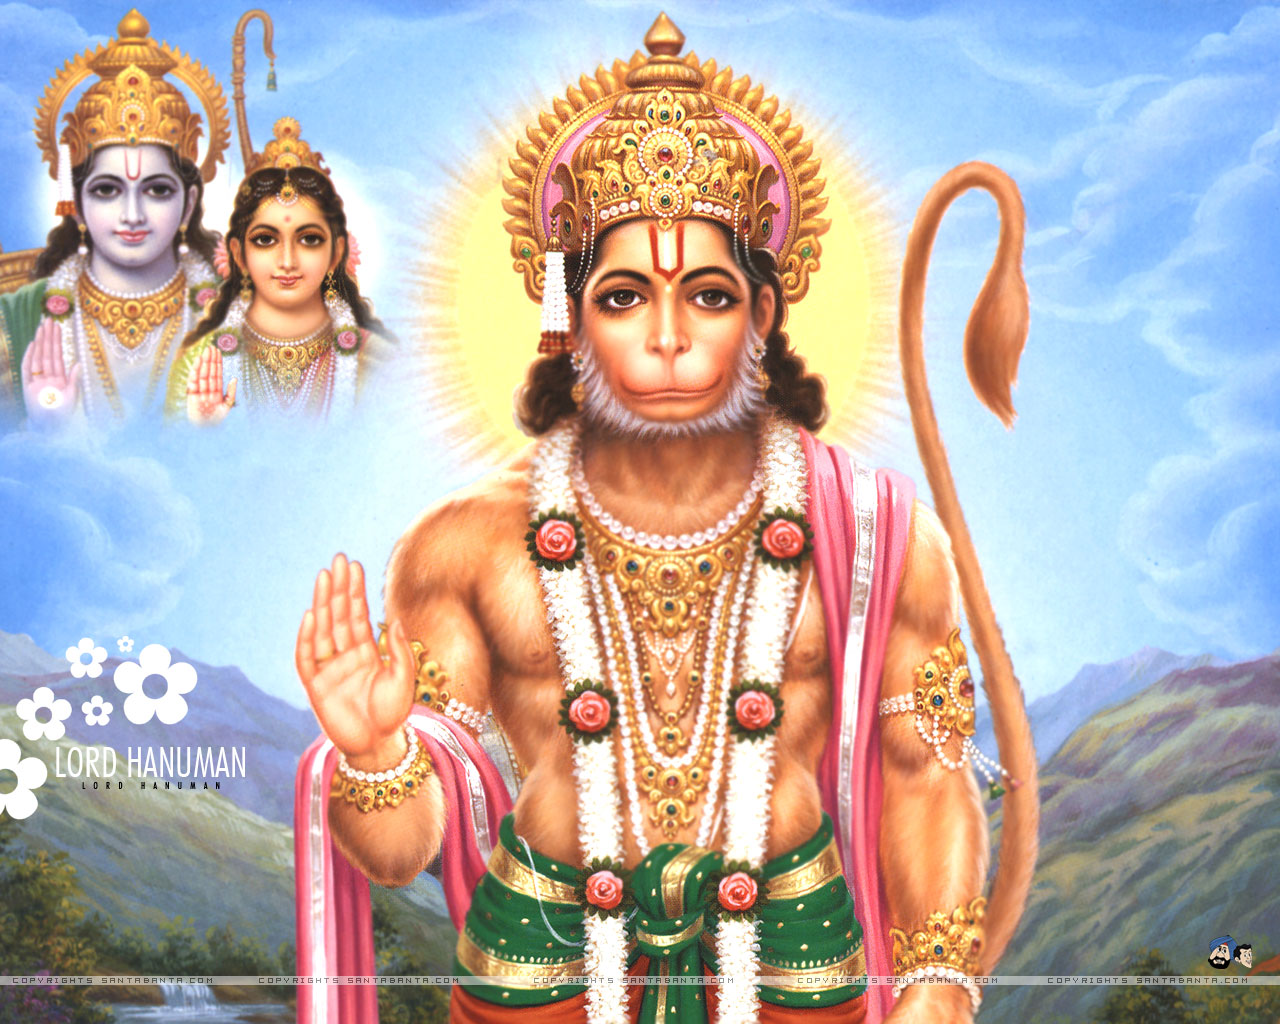 Hindu Gods HD Wallpapers Lord Hanuman Wallpapers 1280x1024